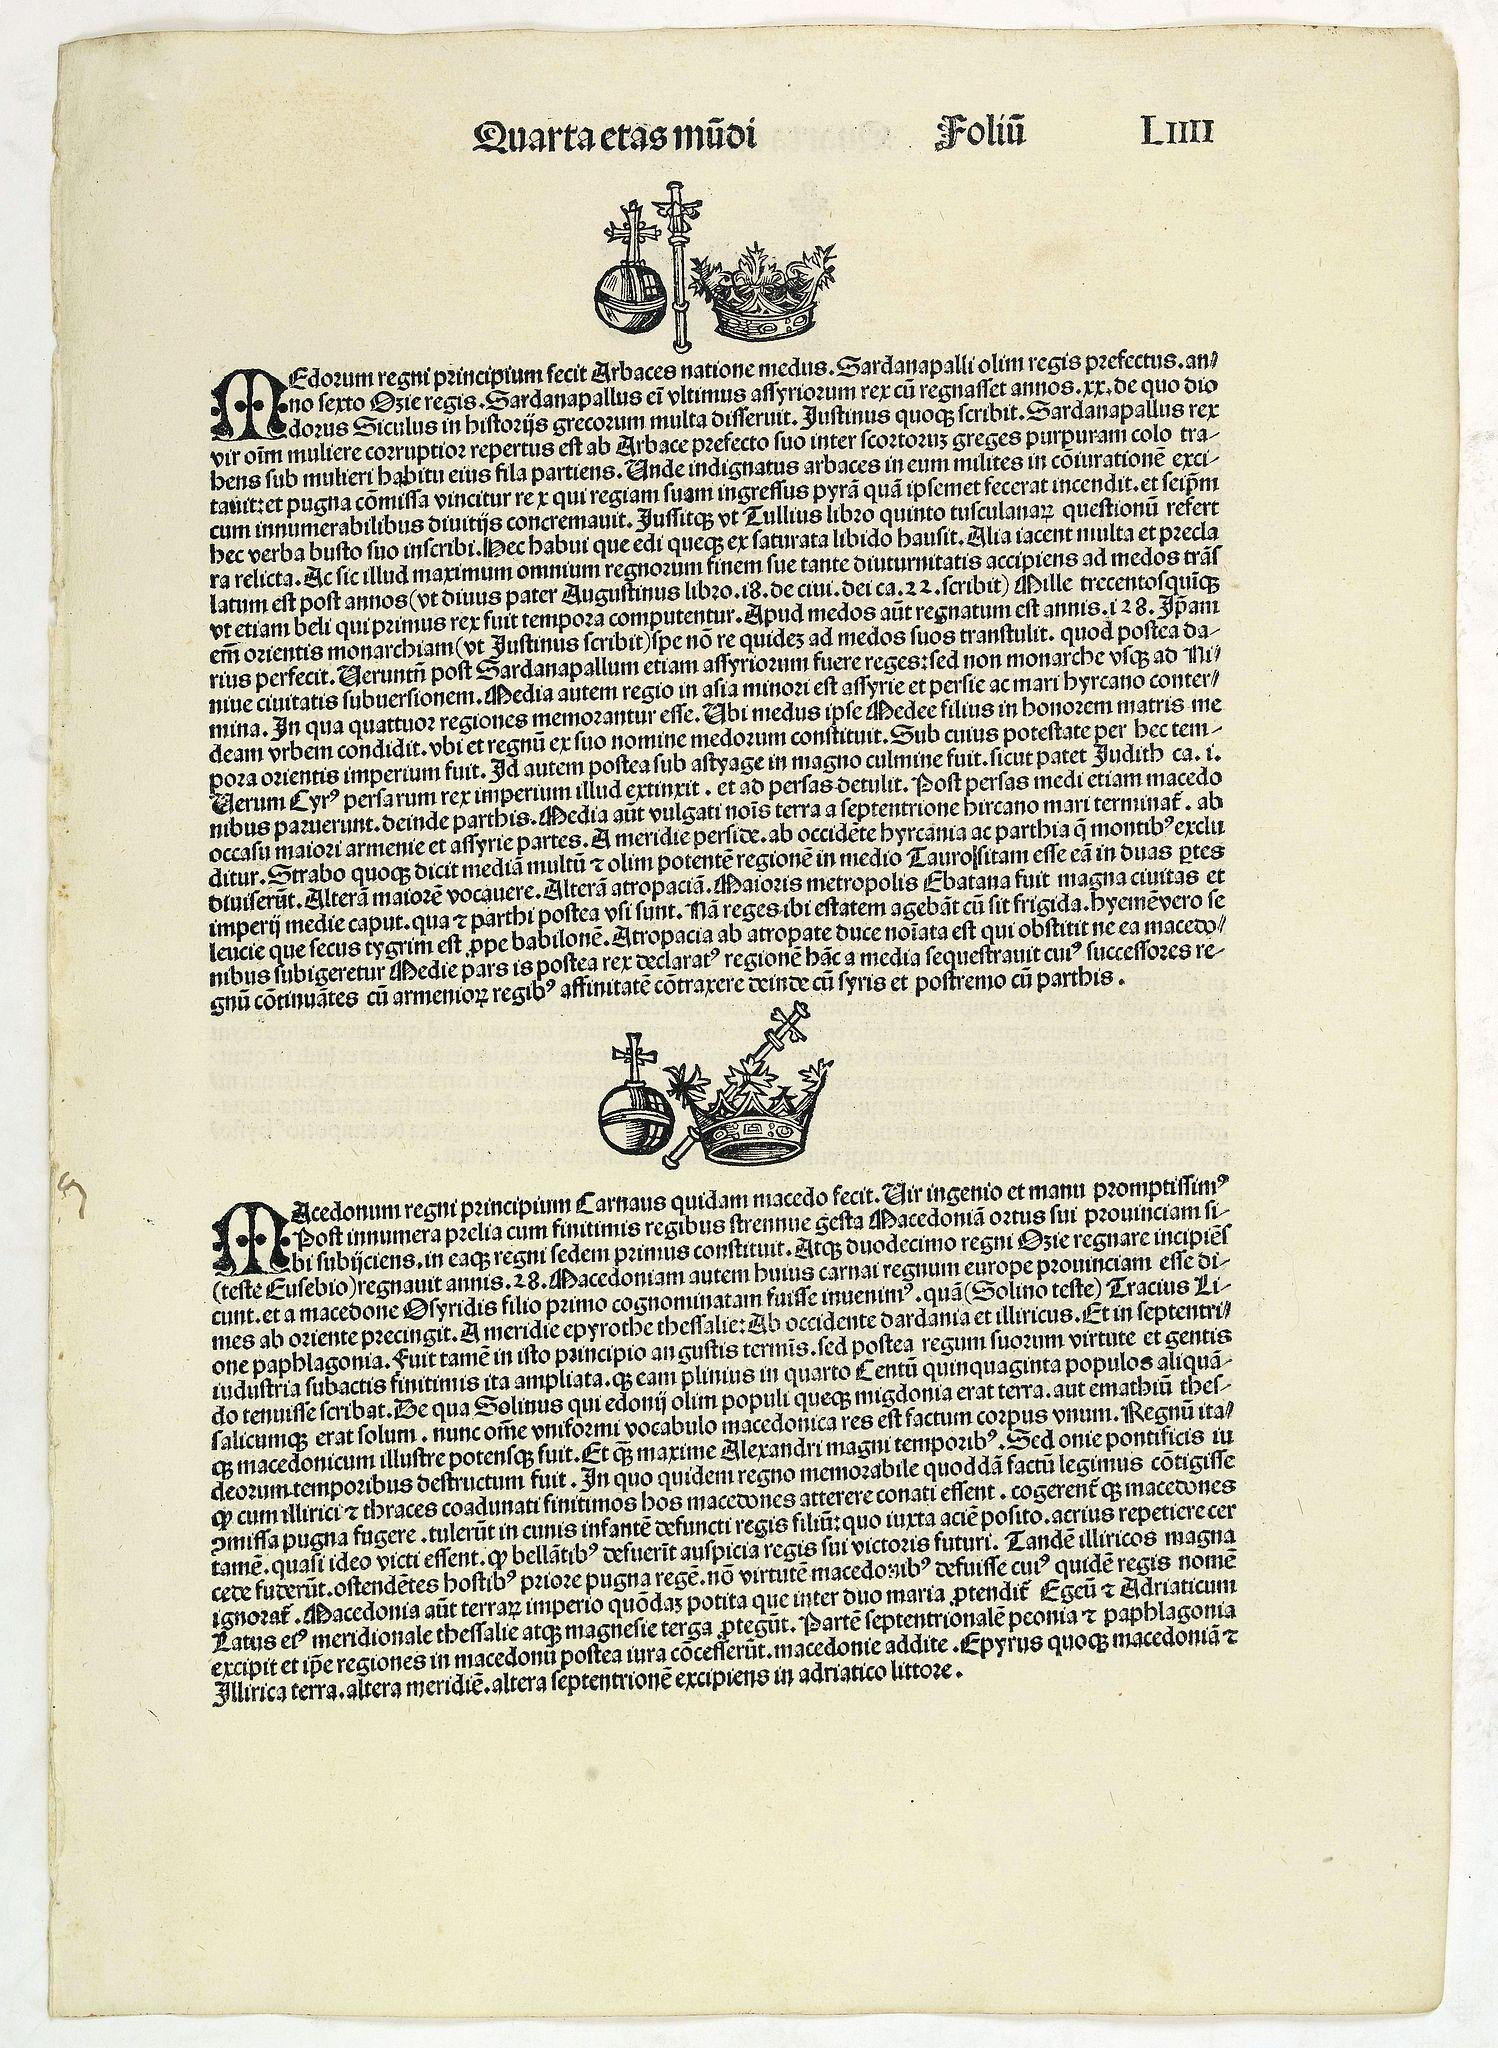 SCHEDEL, H. -  Quarta Etas Mundi. Foliu. LIIII.